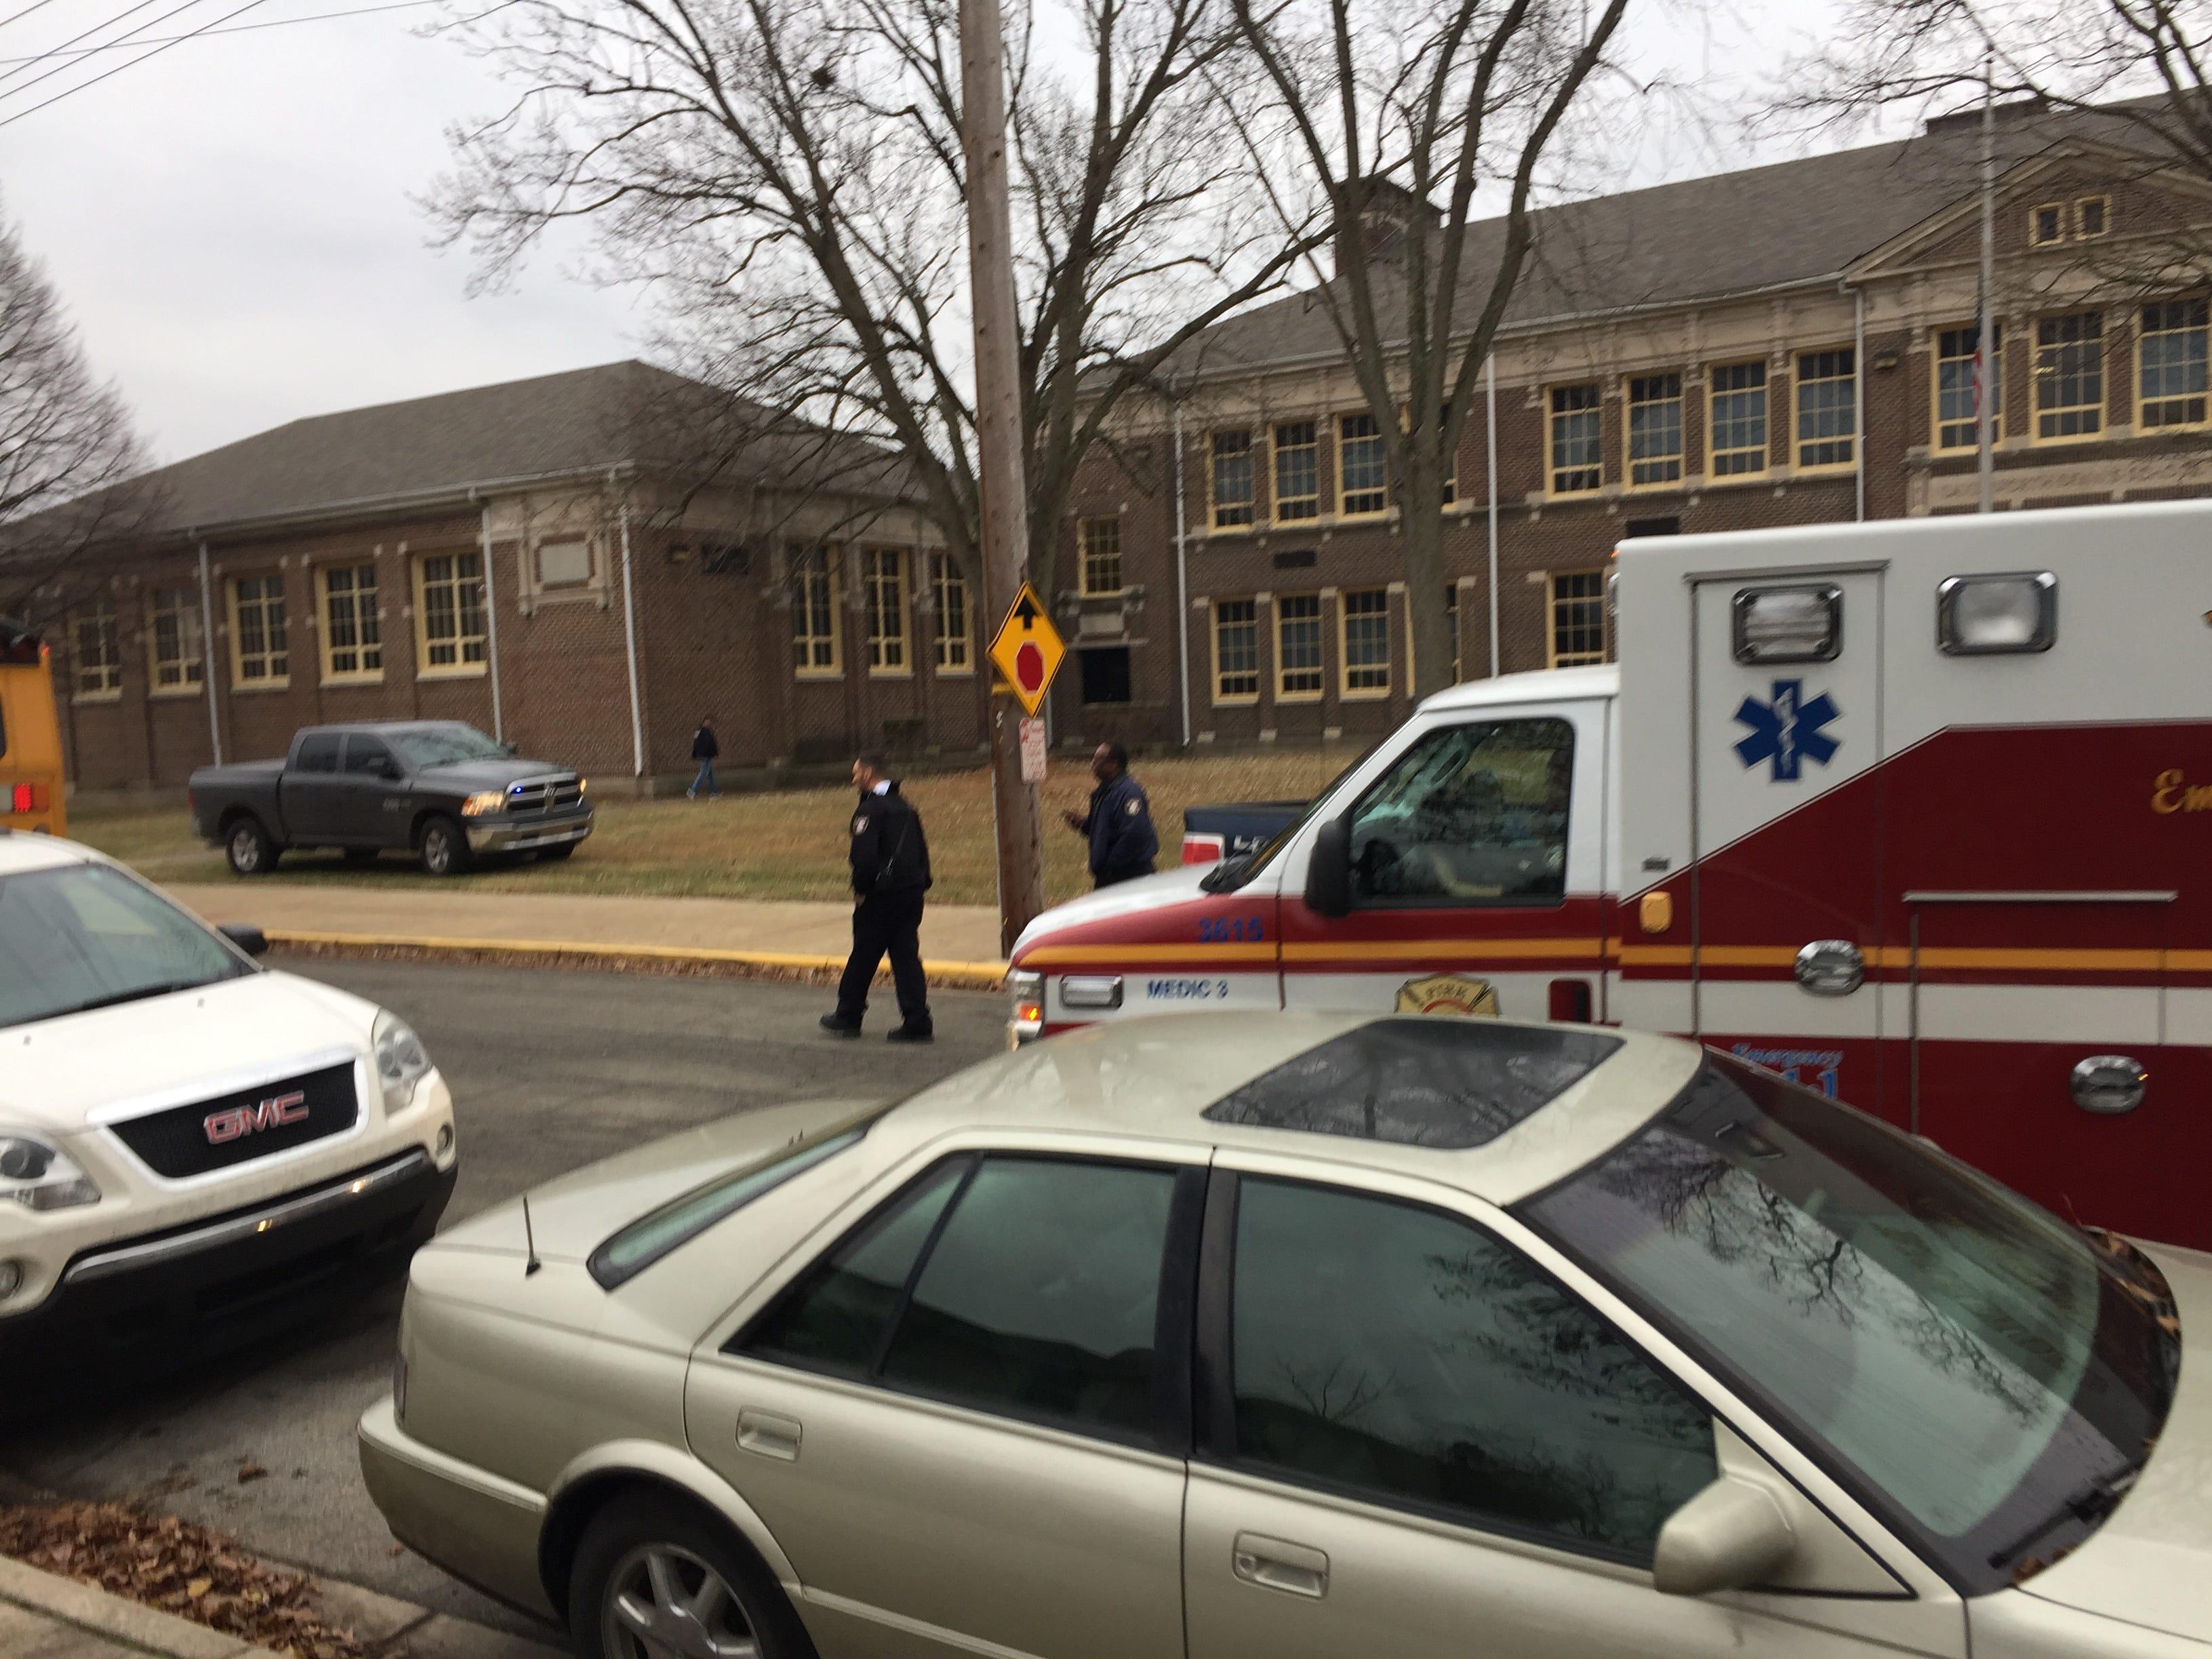 The scene at Dennis Intermediate School.